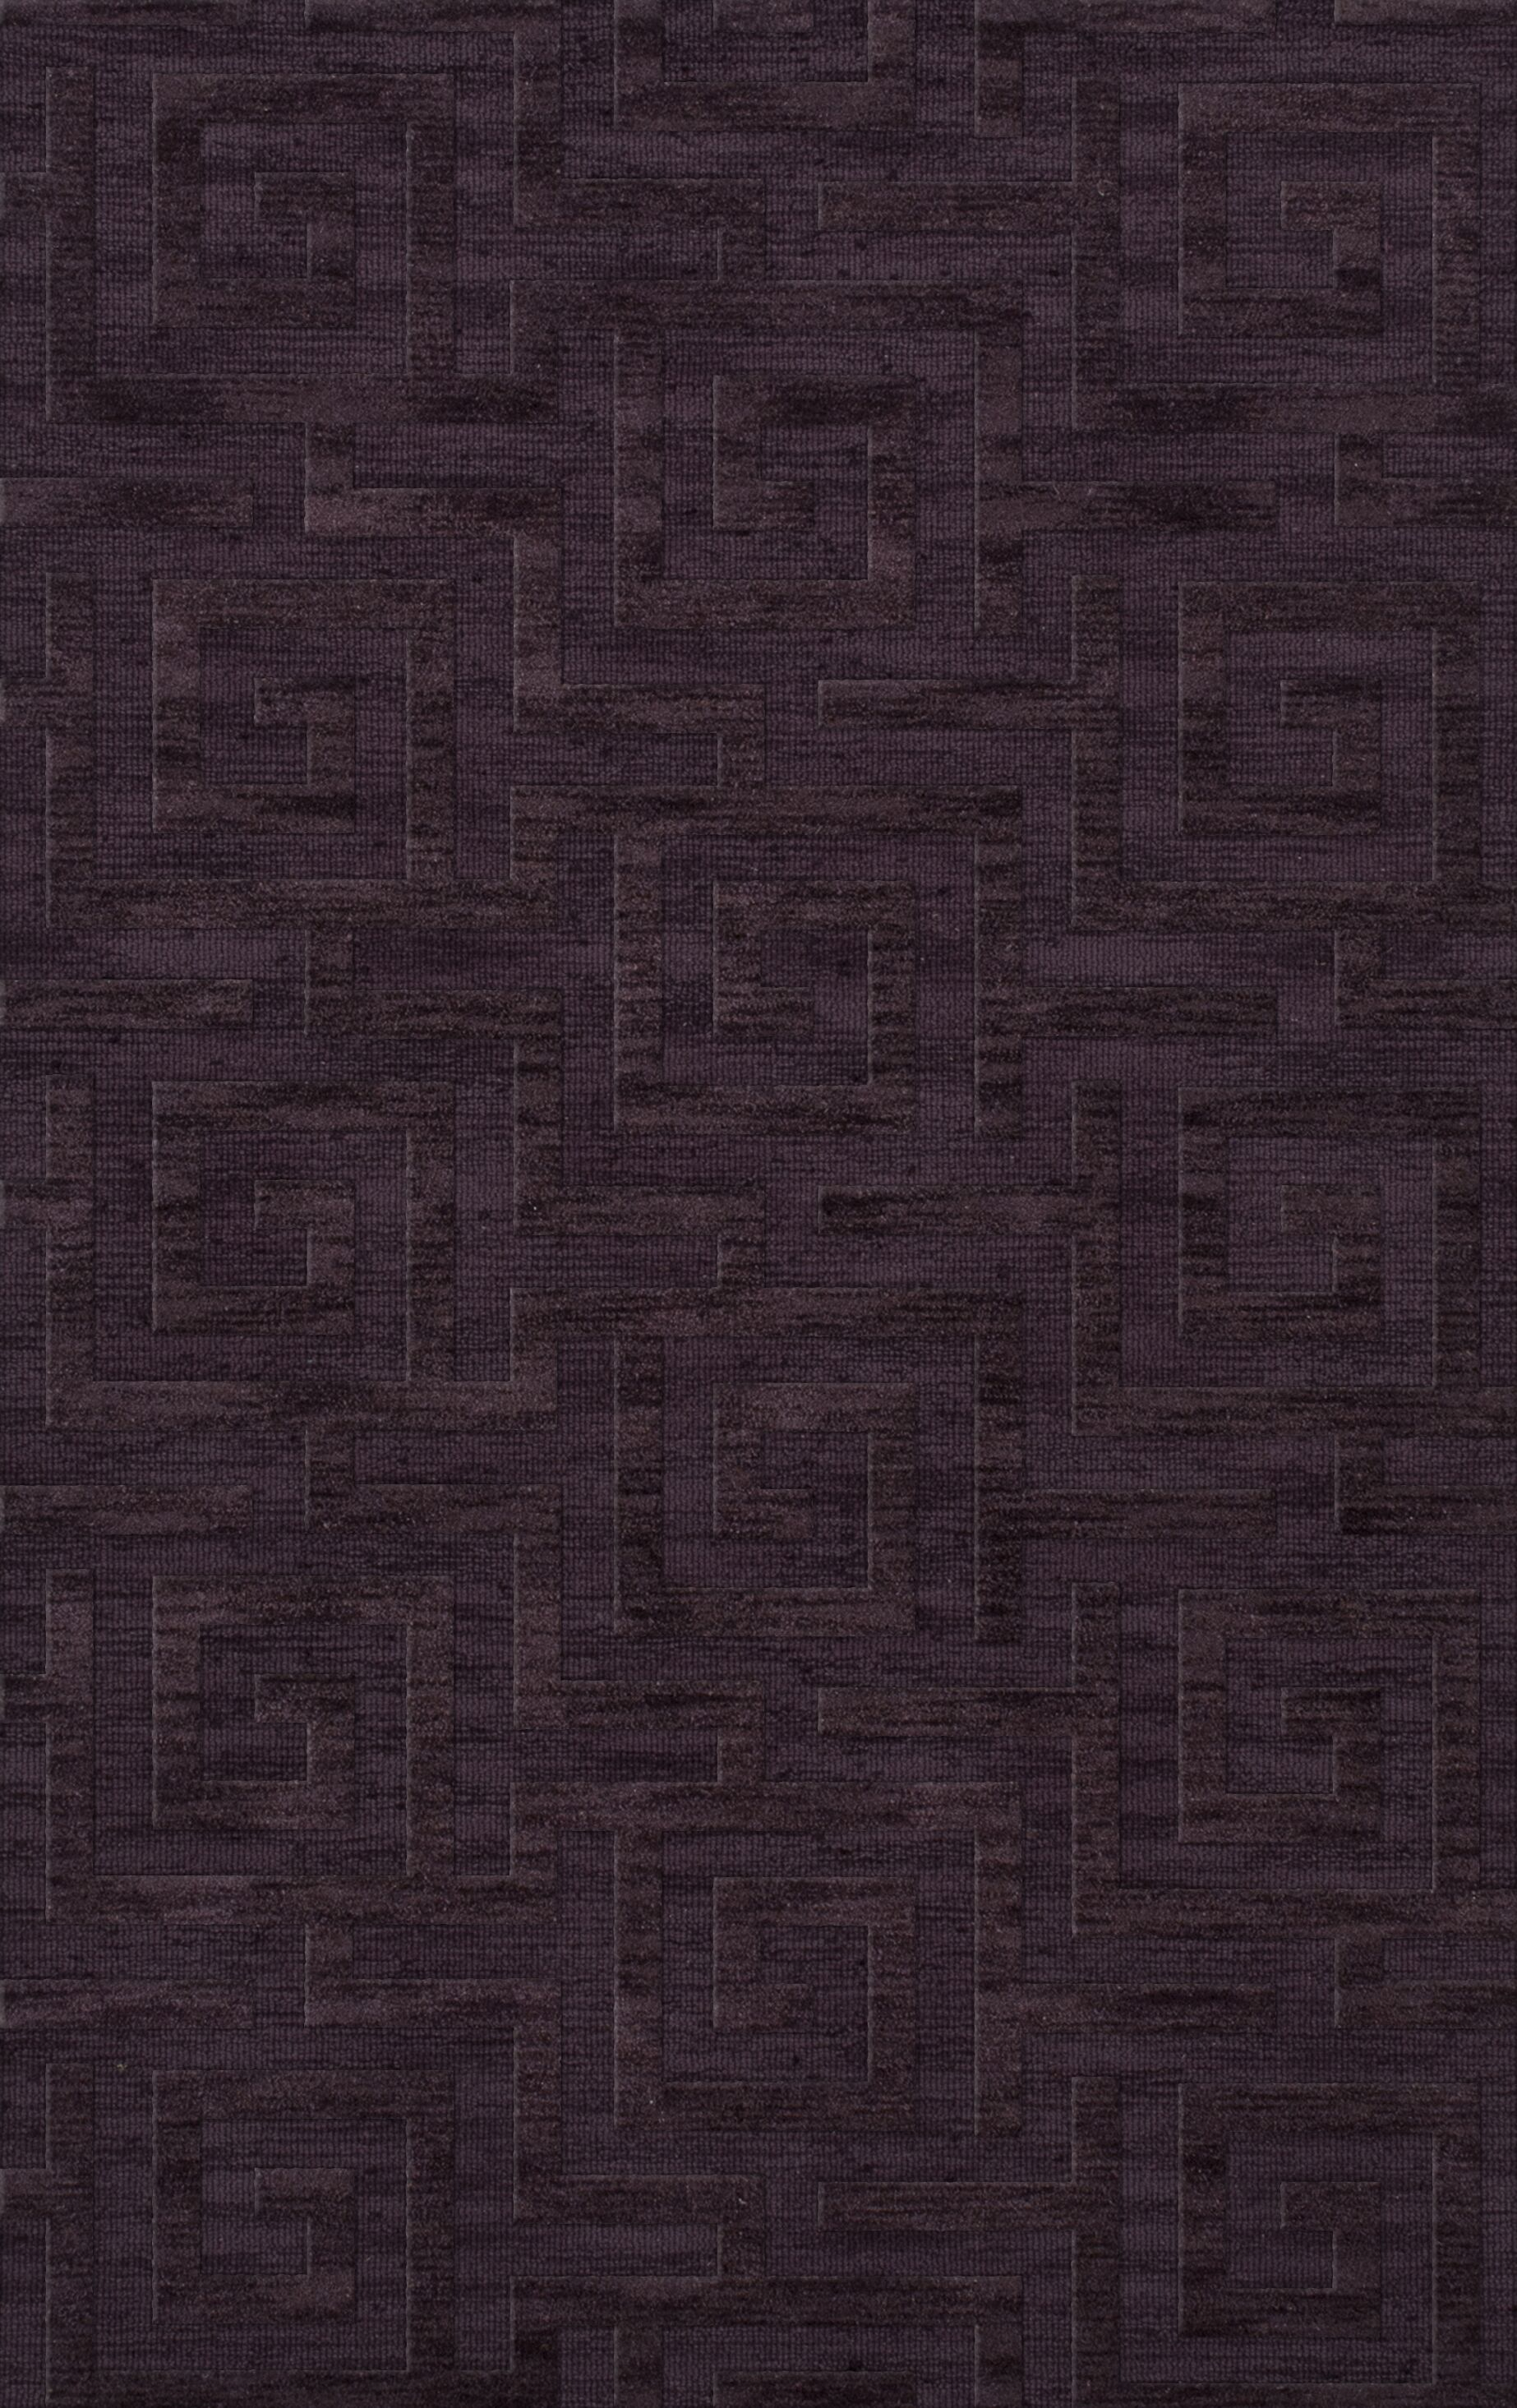 Dover Grape Ice Area Rug Rug Size: Rectangle 6' x 9'